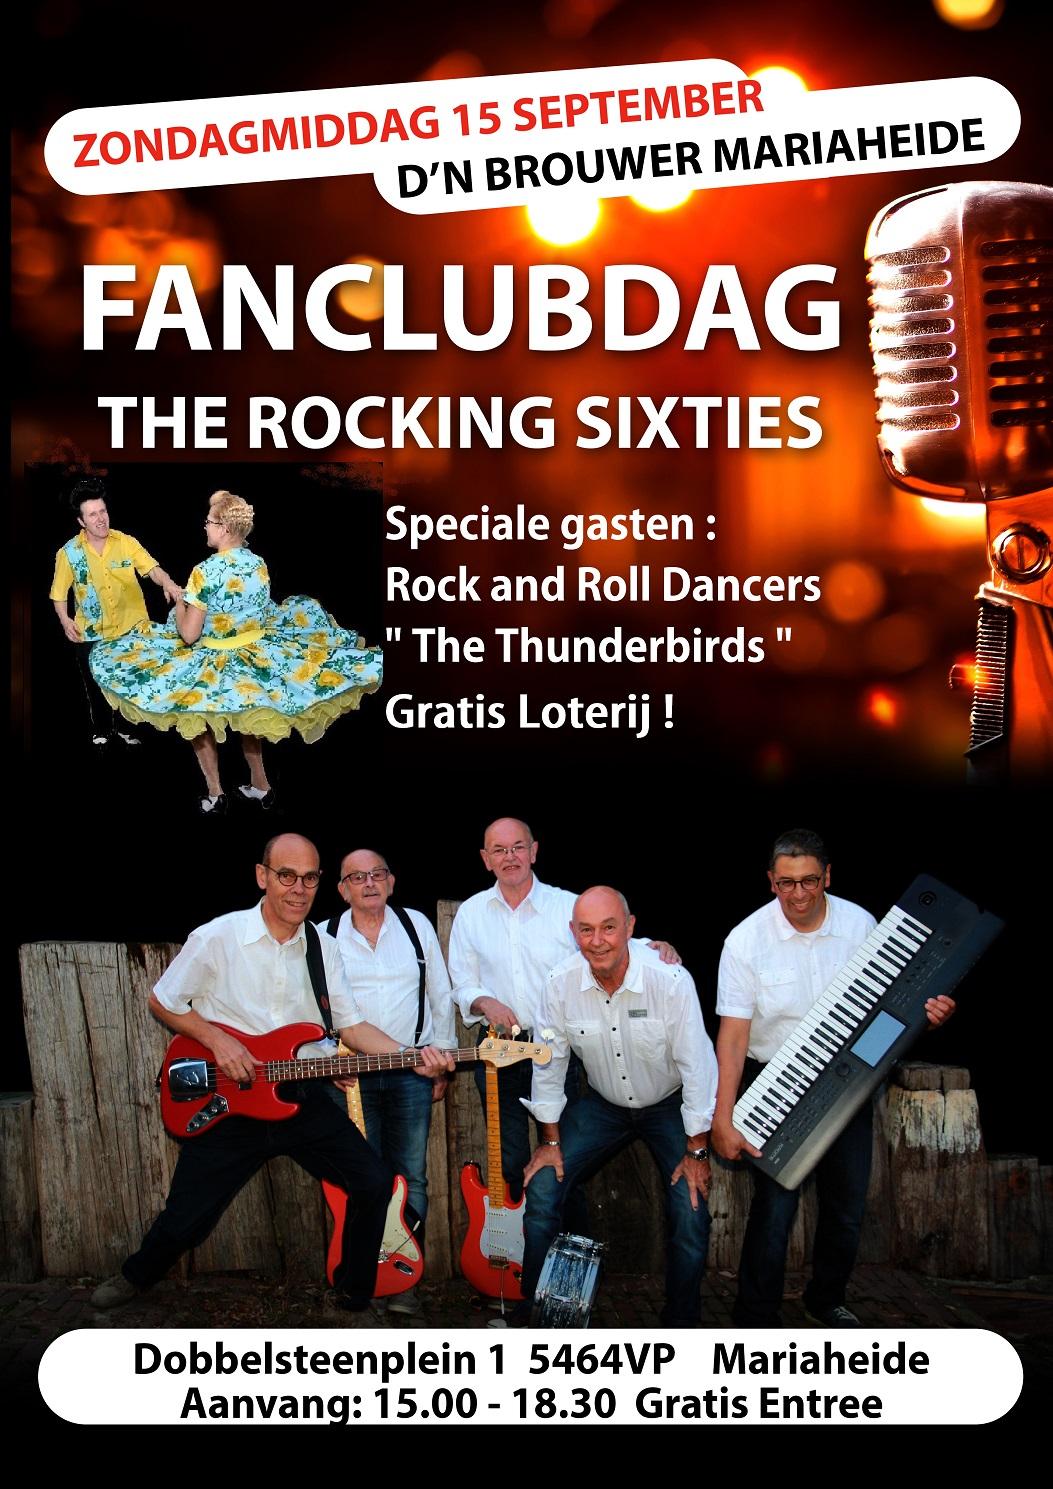 Fanclubdag-2019-The-Rocking-Sixties-15-sept-klein